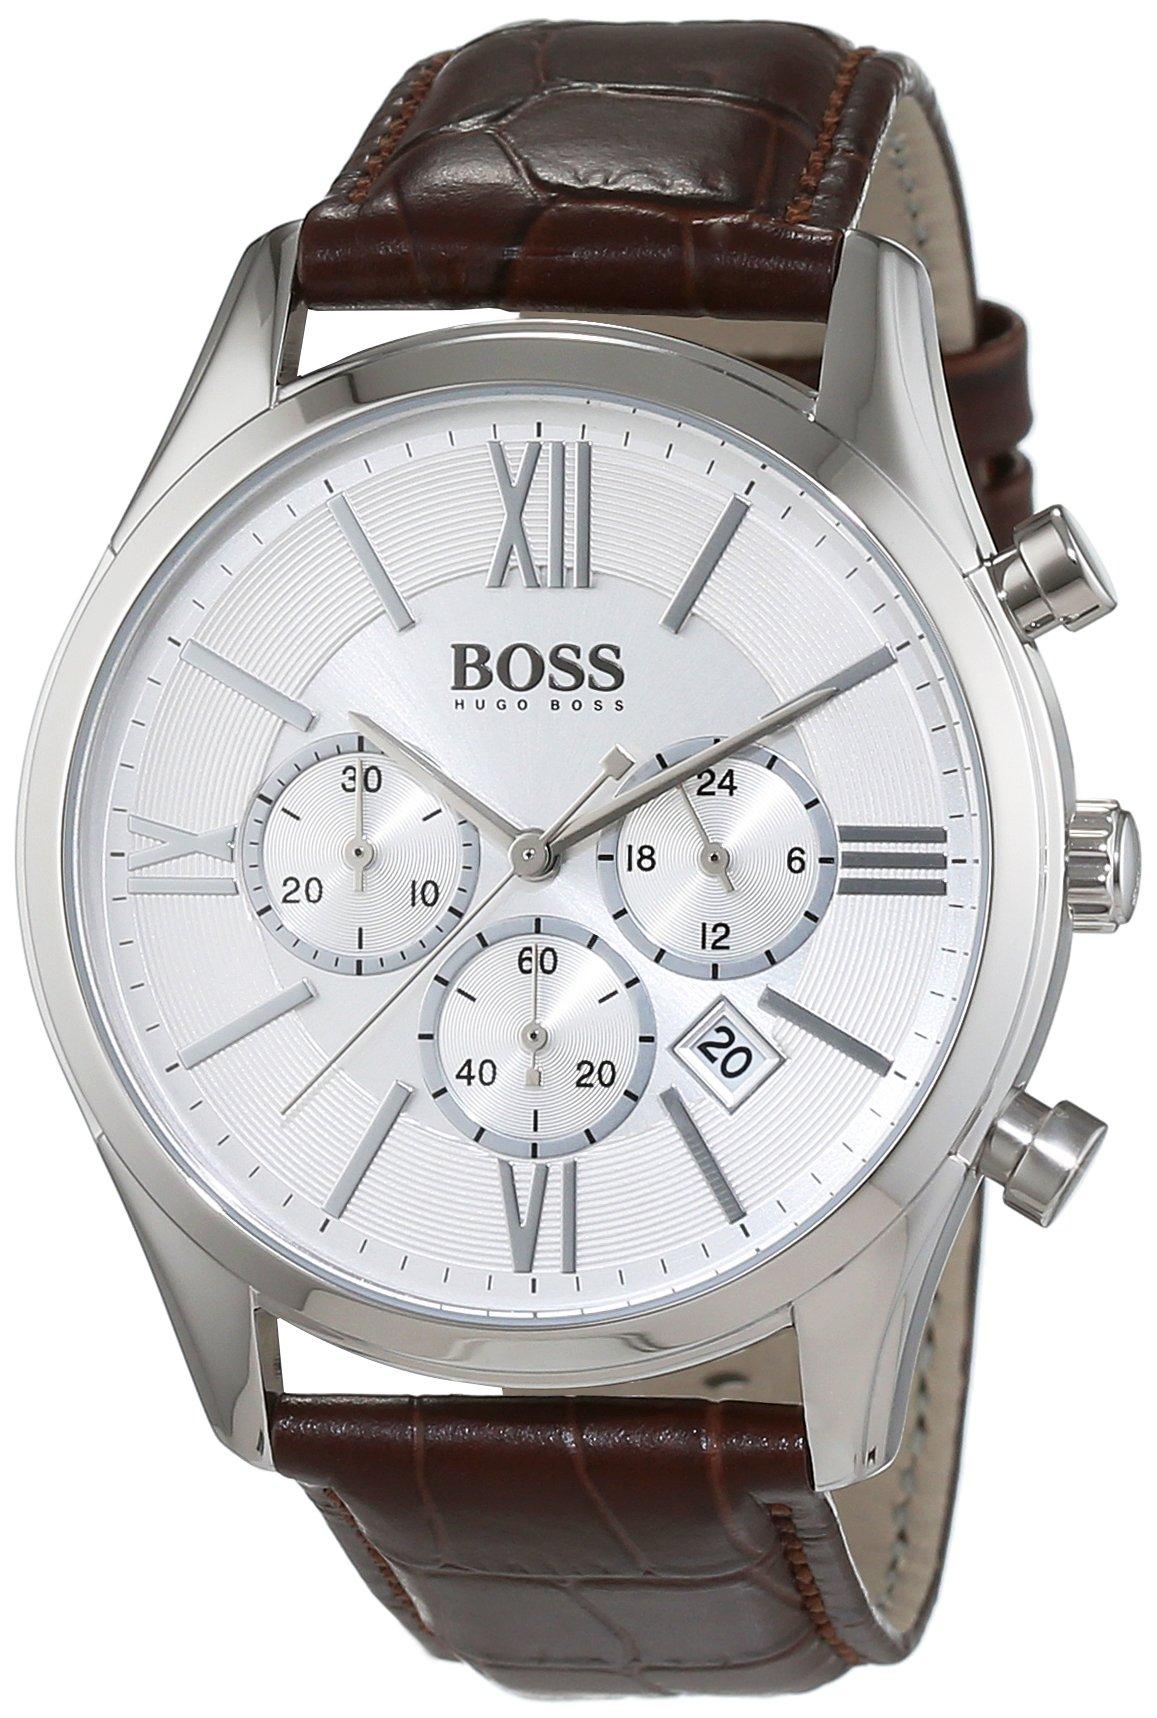 Hugo Boss Mens Men's Chronograph Analog Dress Quartz Watch 1513195 by Hugo Boss